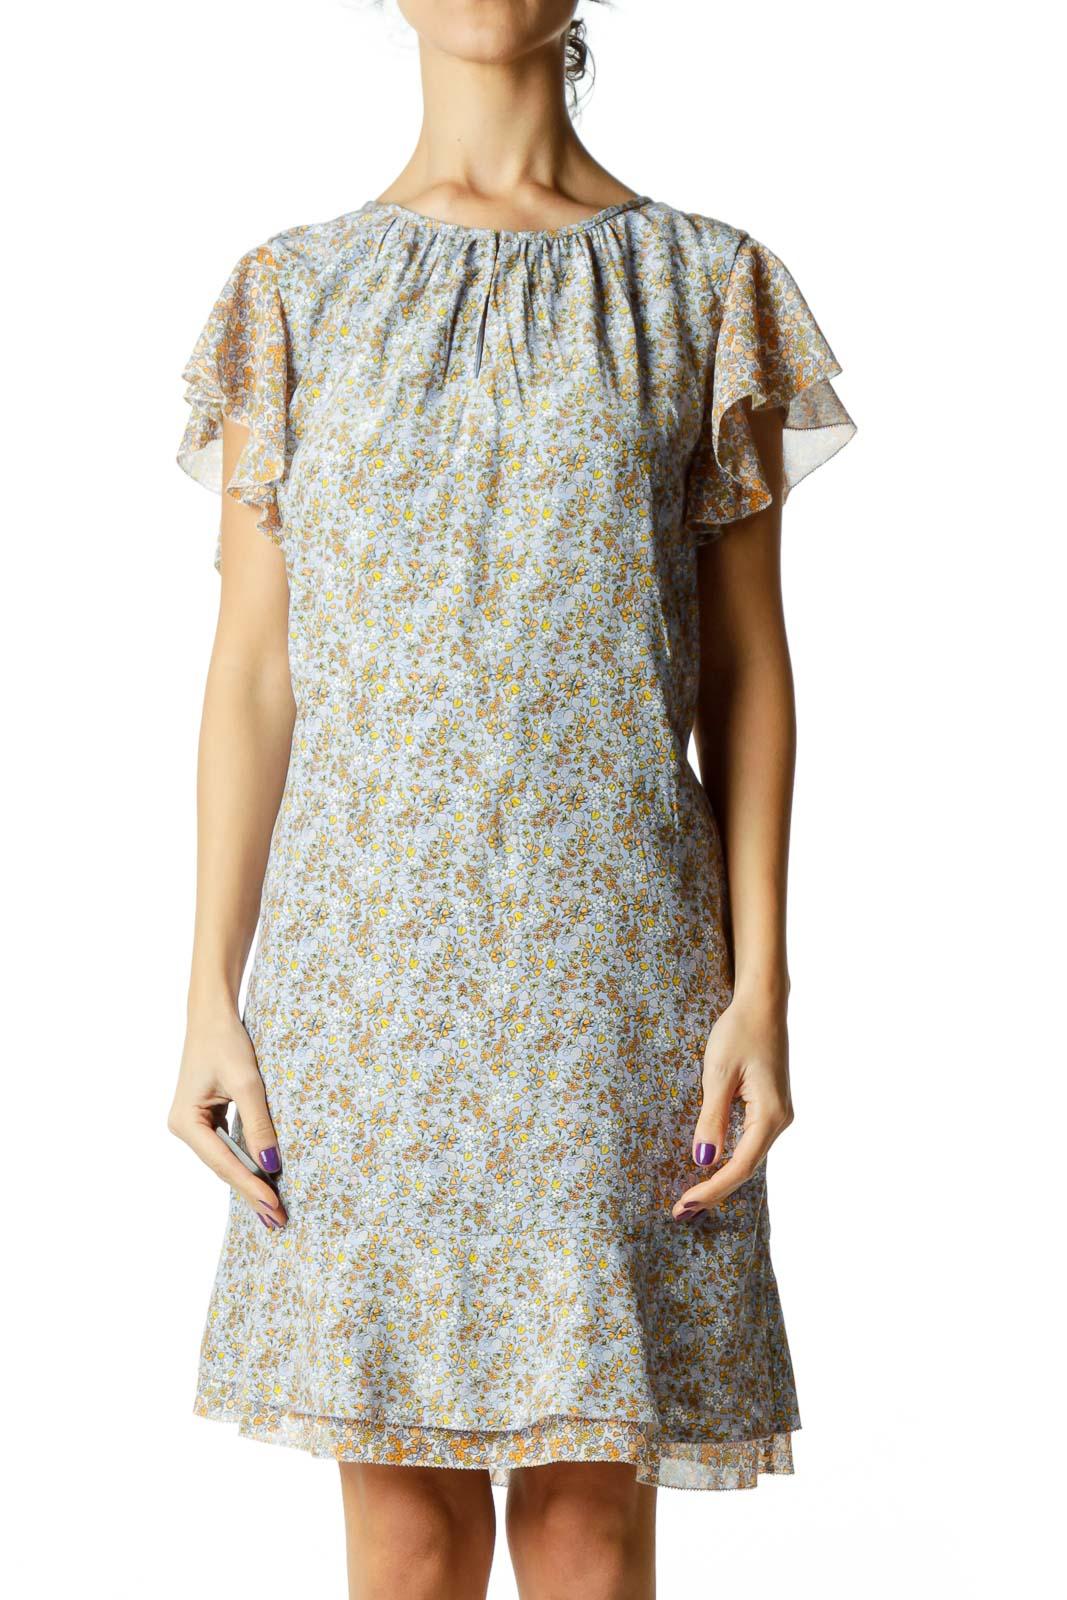 Blue Flower Print Day Dress